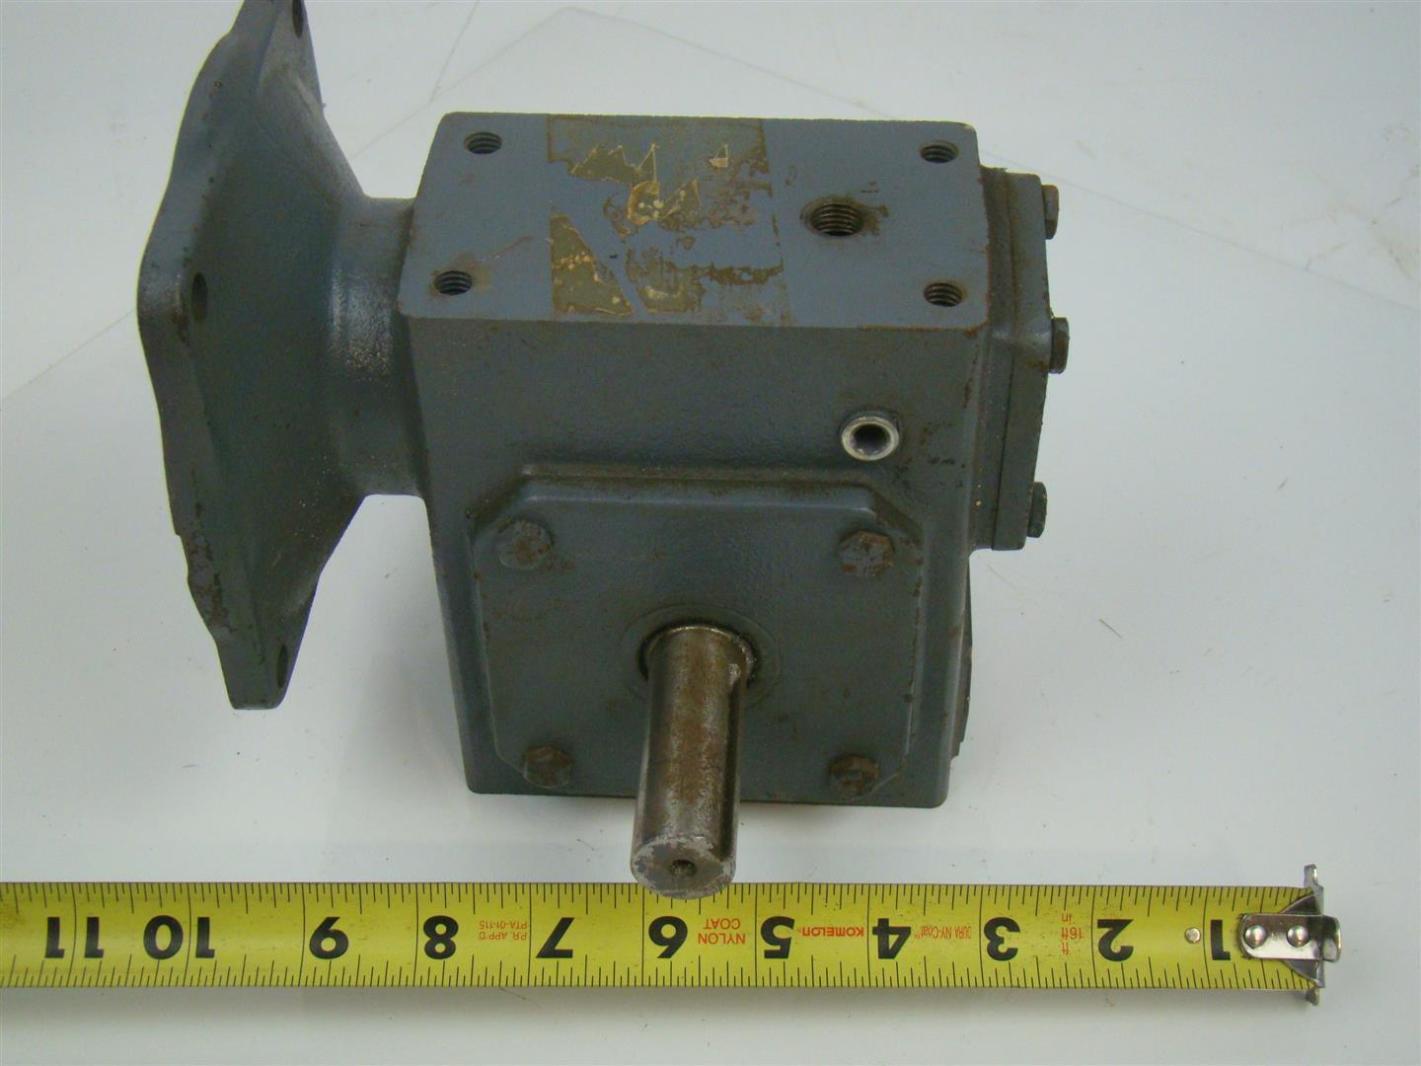 Hub City Gear Reducer 5 1 Ratio 0220 61219 211 214 Ebay